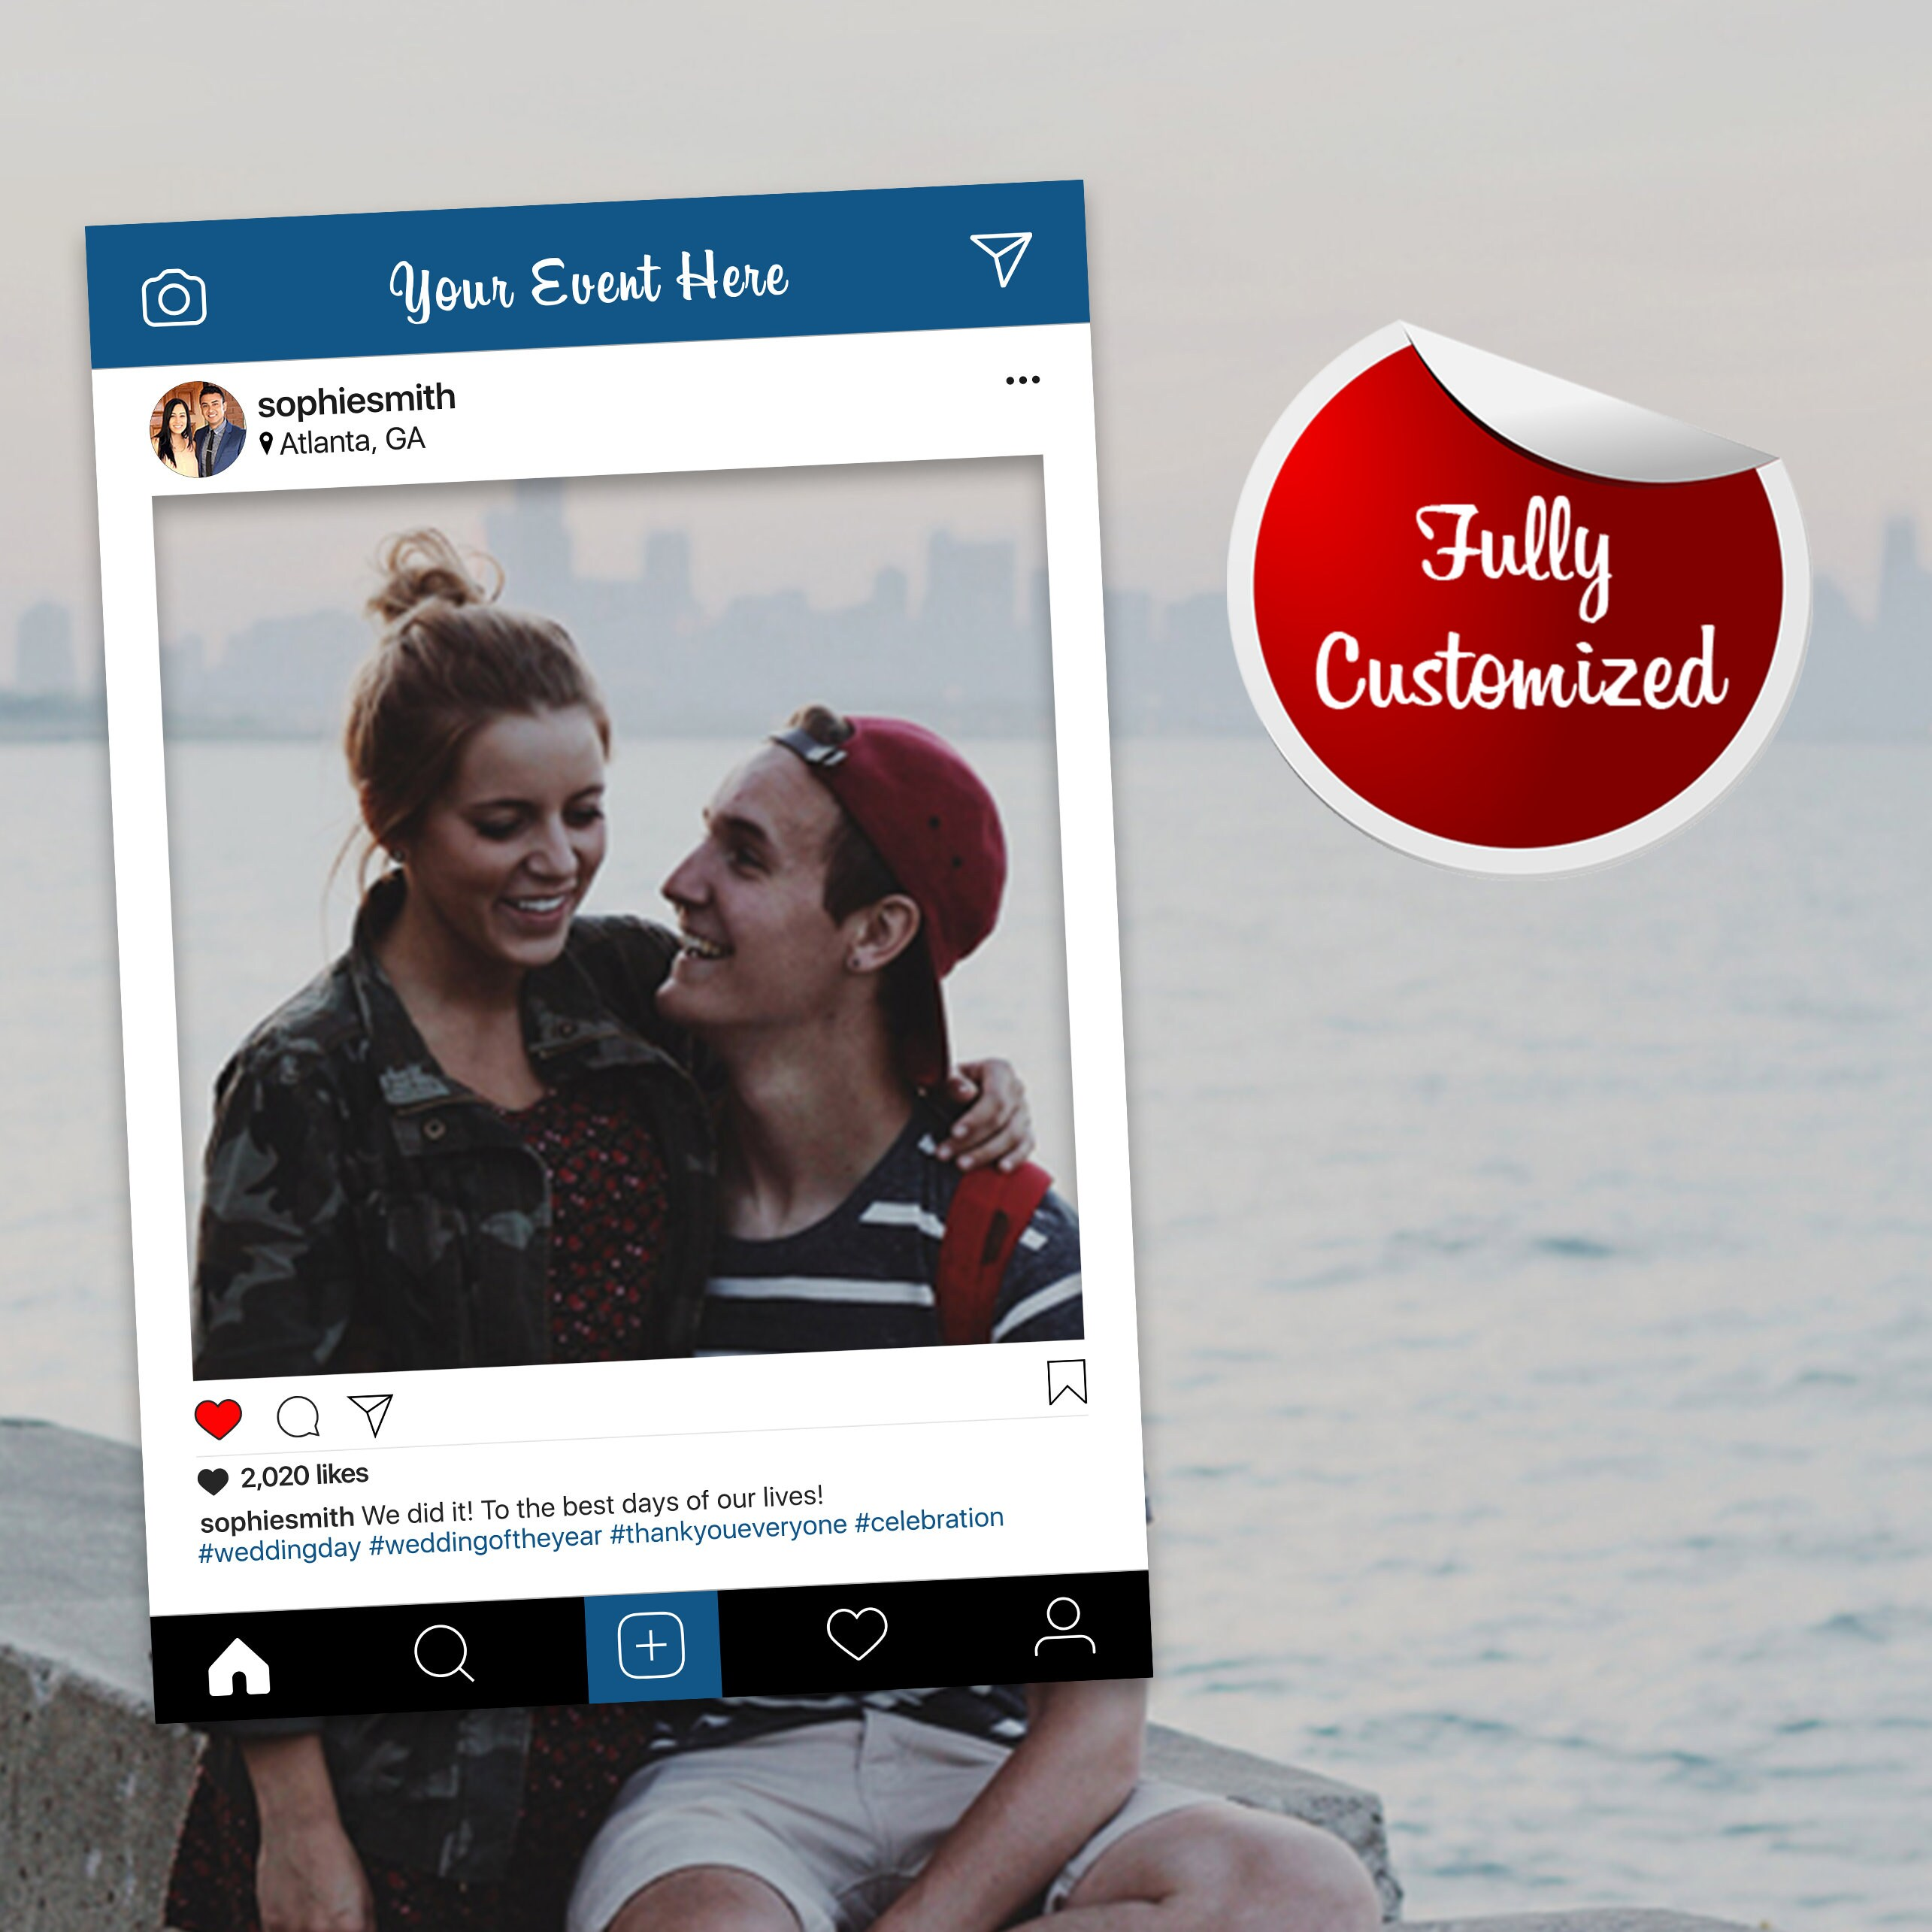 Instaframe Social Media Selfie Frame Photo Booth Prop Poster